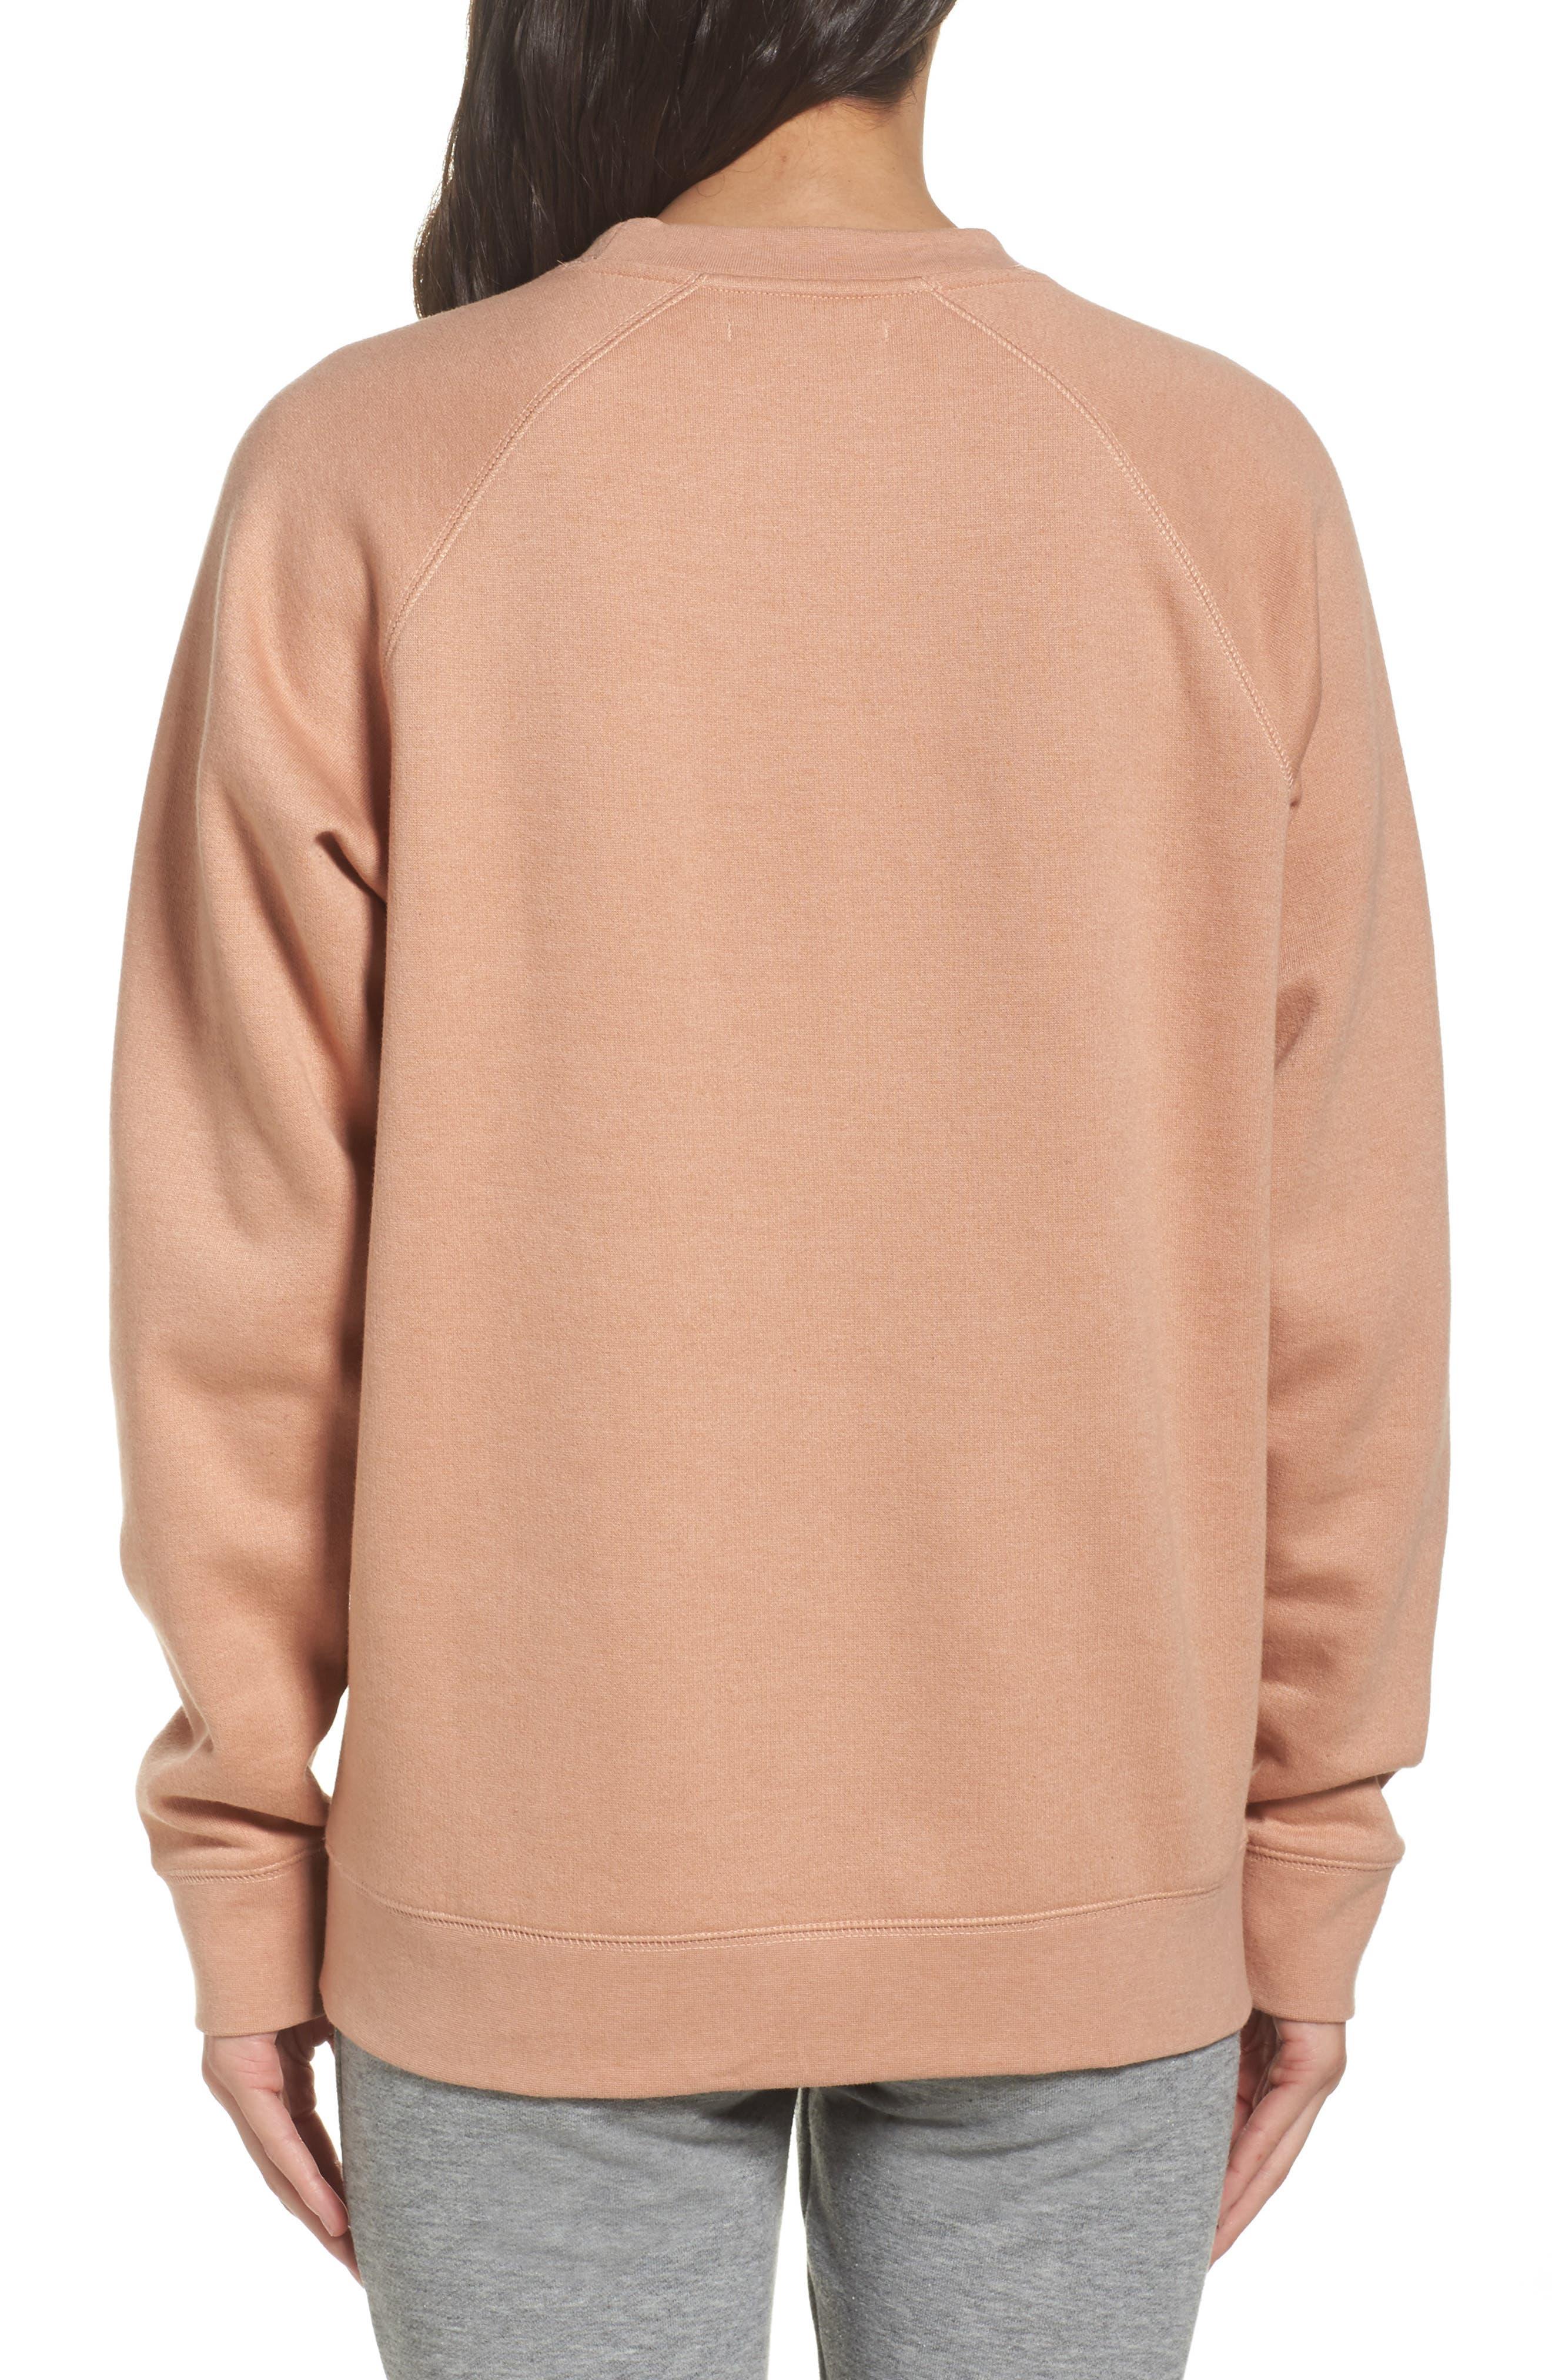 Rosé Okay Sweatshirt,                             Alternate thumbnail 2, color,                             Beige